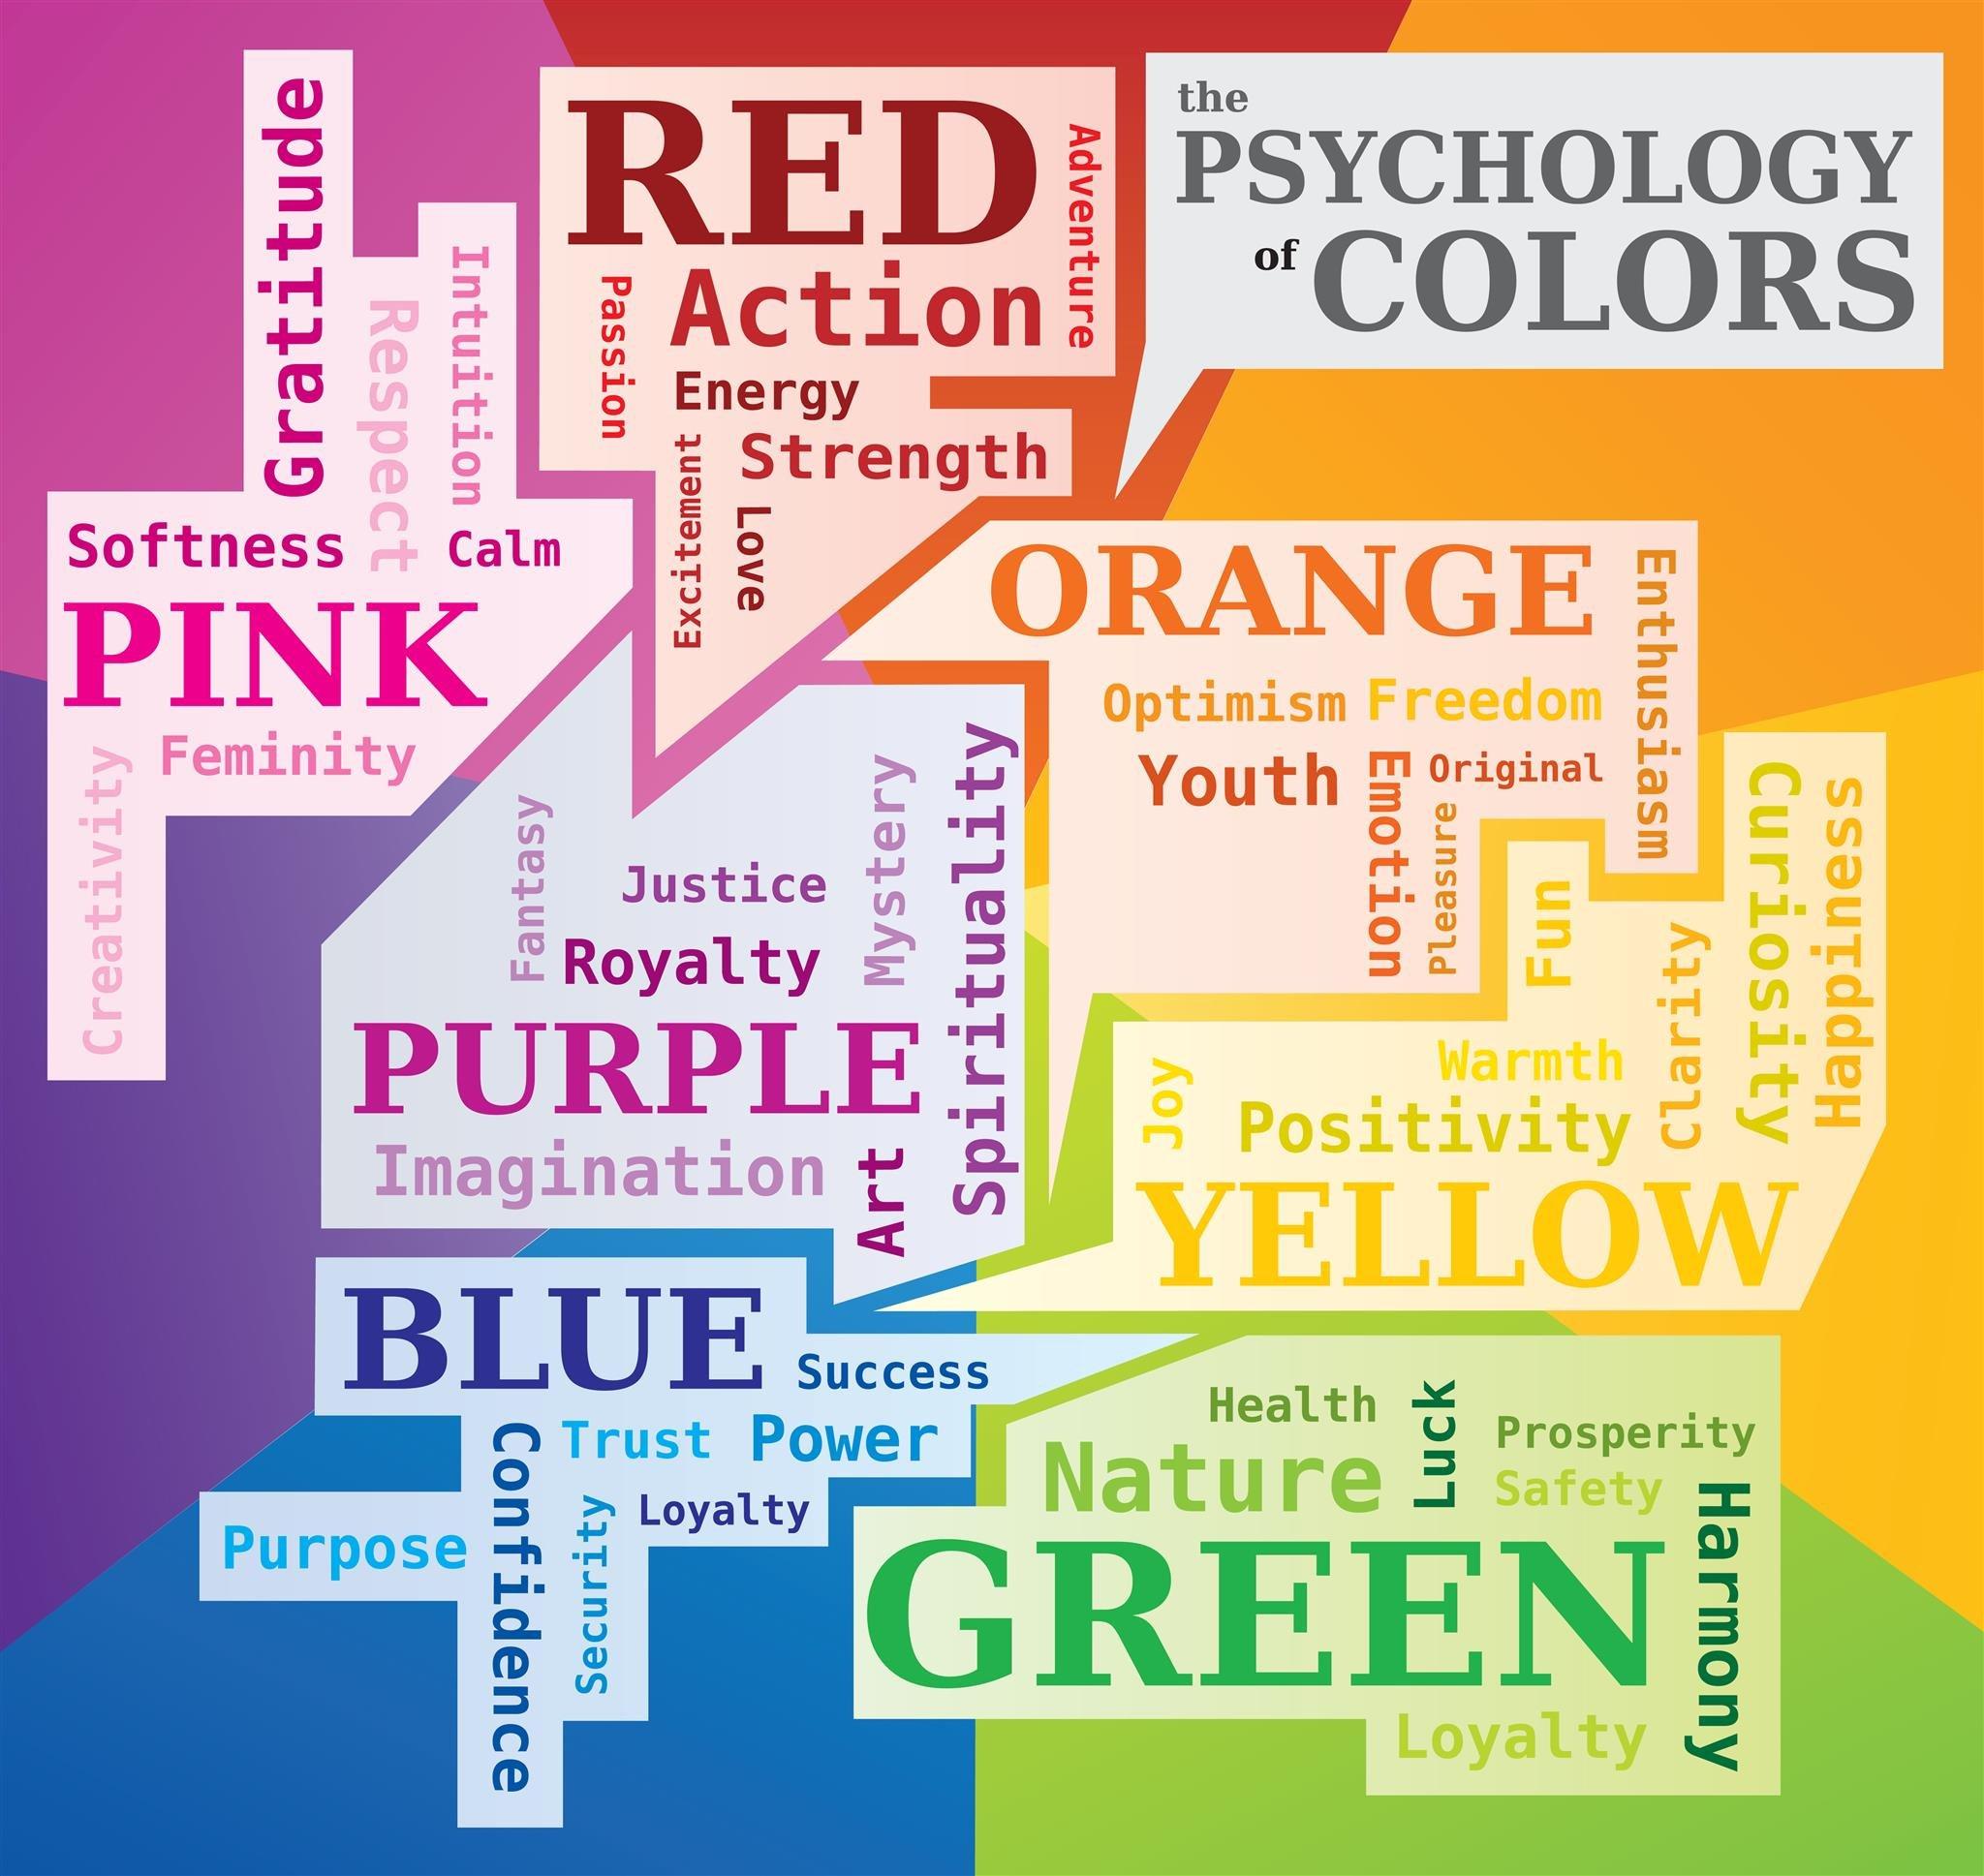 diagrama ilustrado com as cores e seus significados